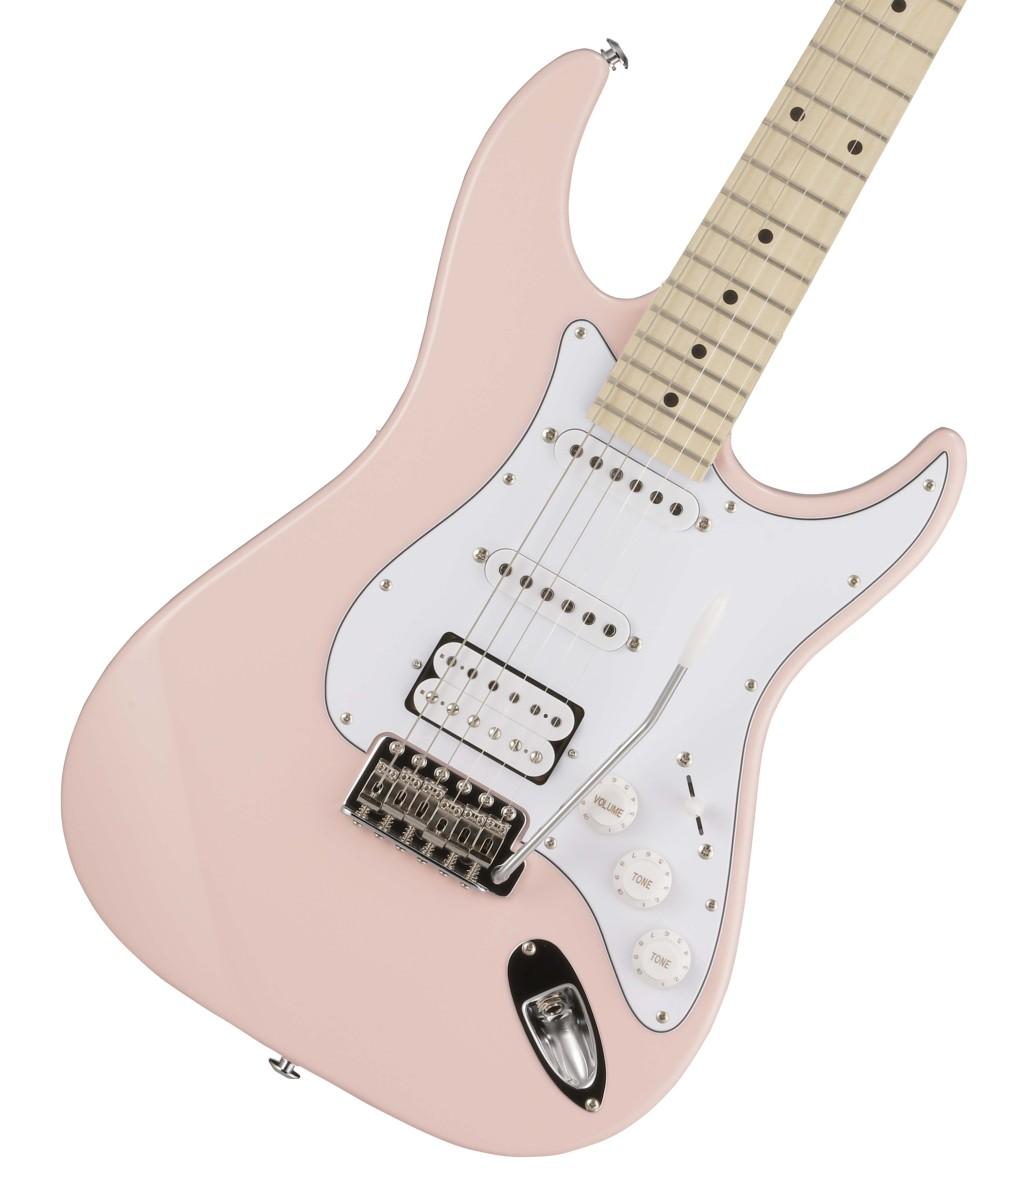 Greco / WS-STD SSH Light Pink (LPK) Maple Fingerboard グレコ【お取り寄せ商品】